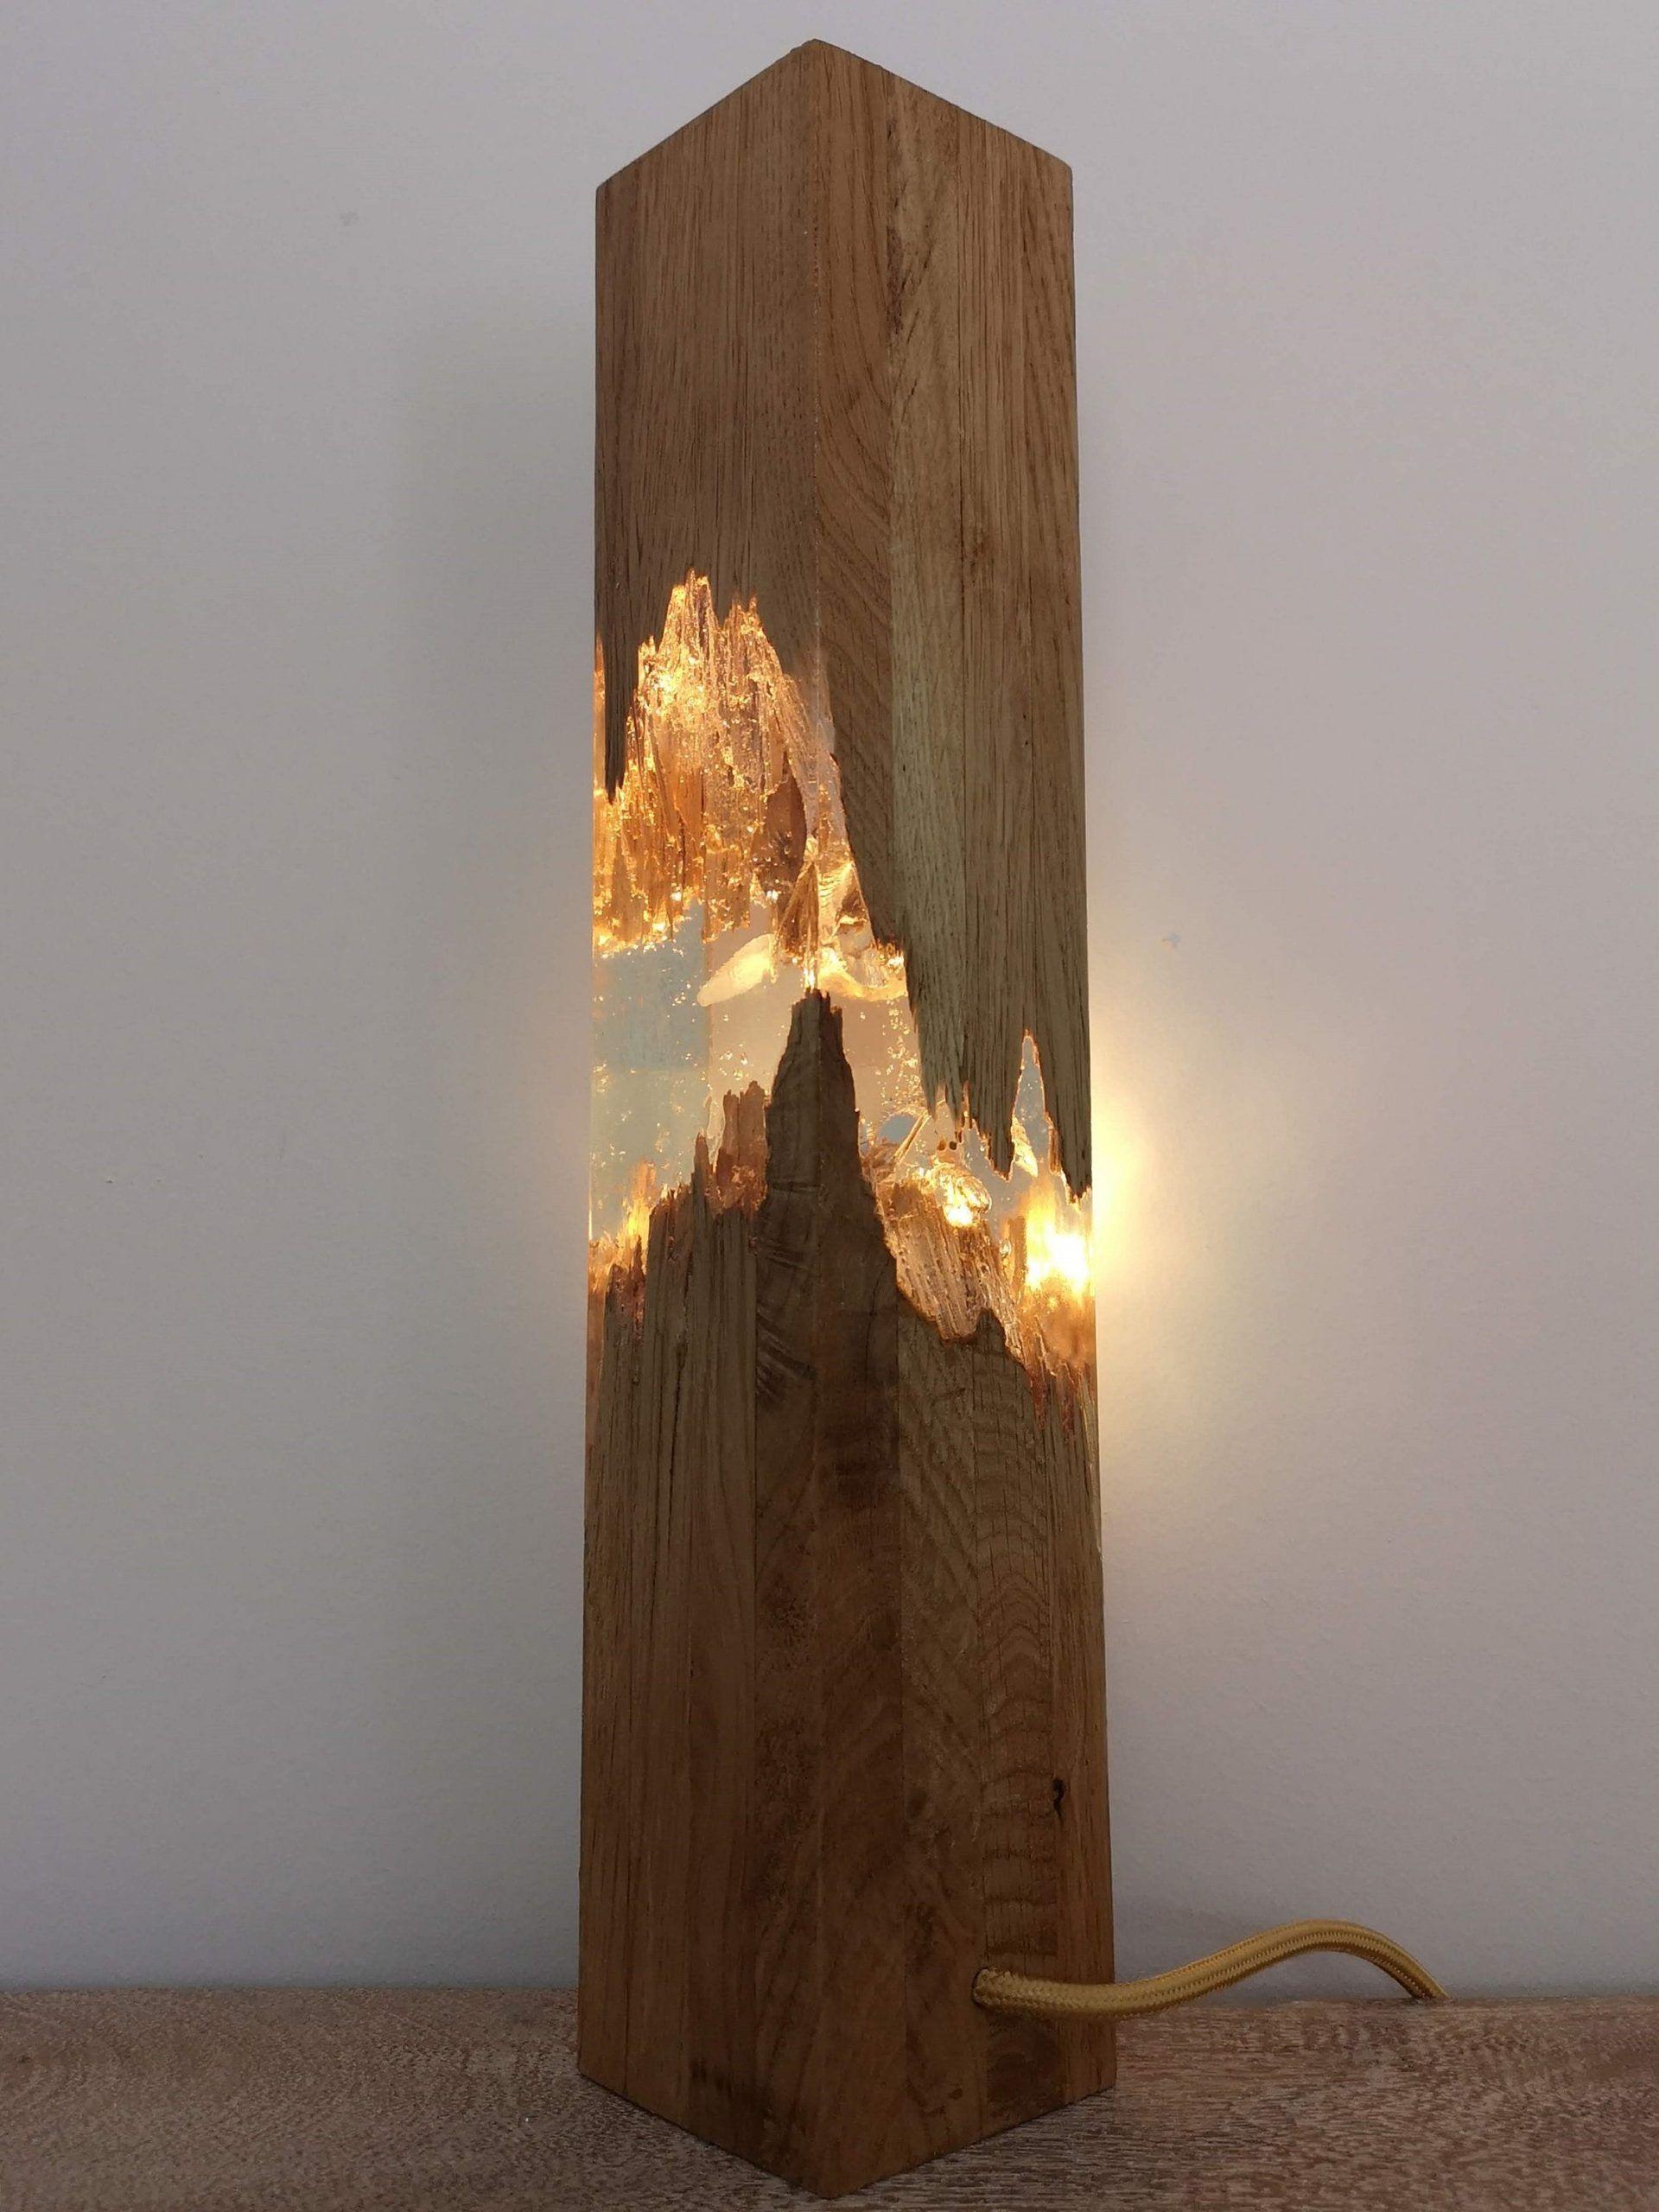 Epoxy Wood Lamp Lamp Night Lamp Resin Table Decor Decor Light Decor Epoxy Lamp Light Night Resin Table W In 2020 Wood Lamp Design Wood Lamps Handmade Lamps